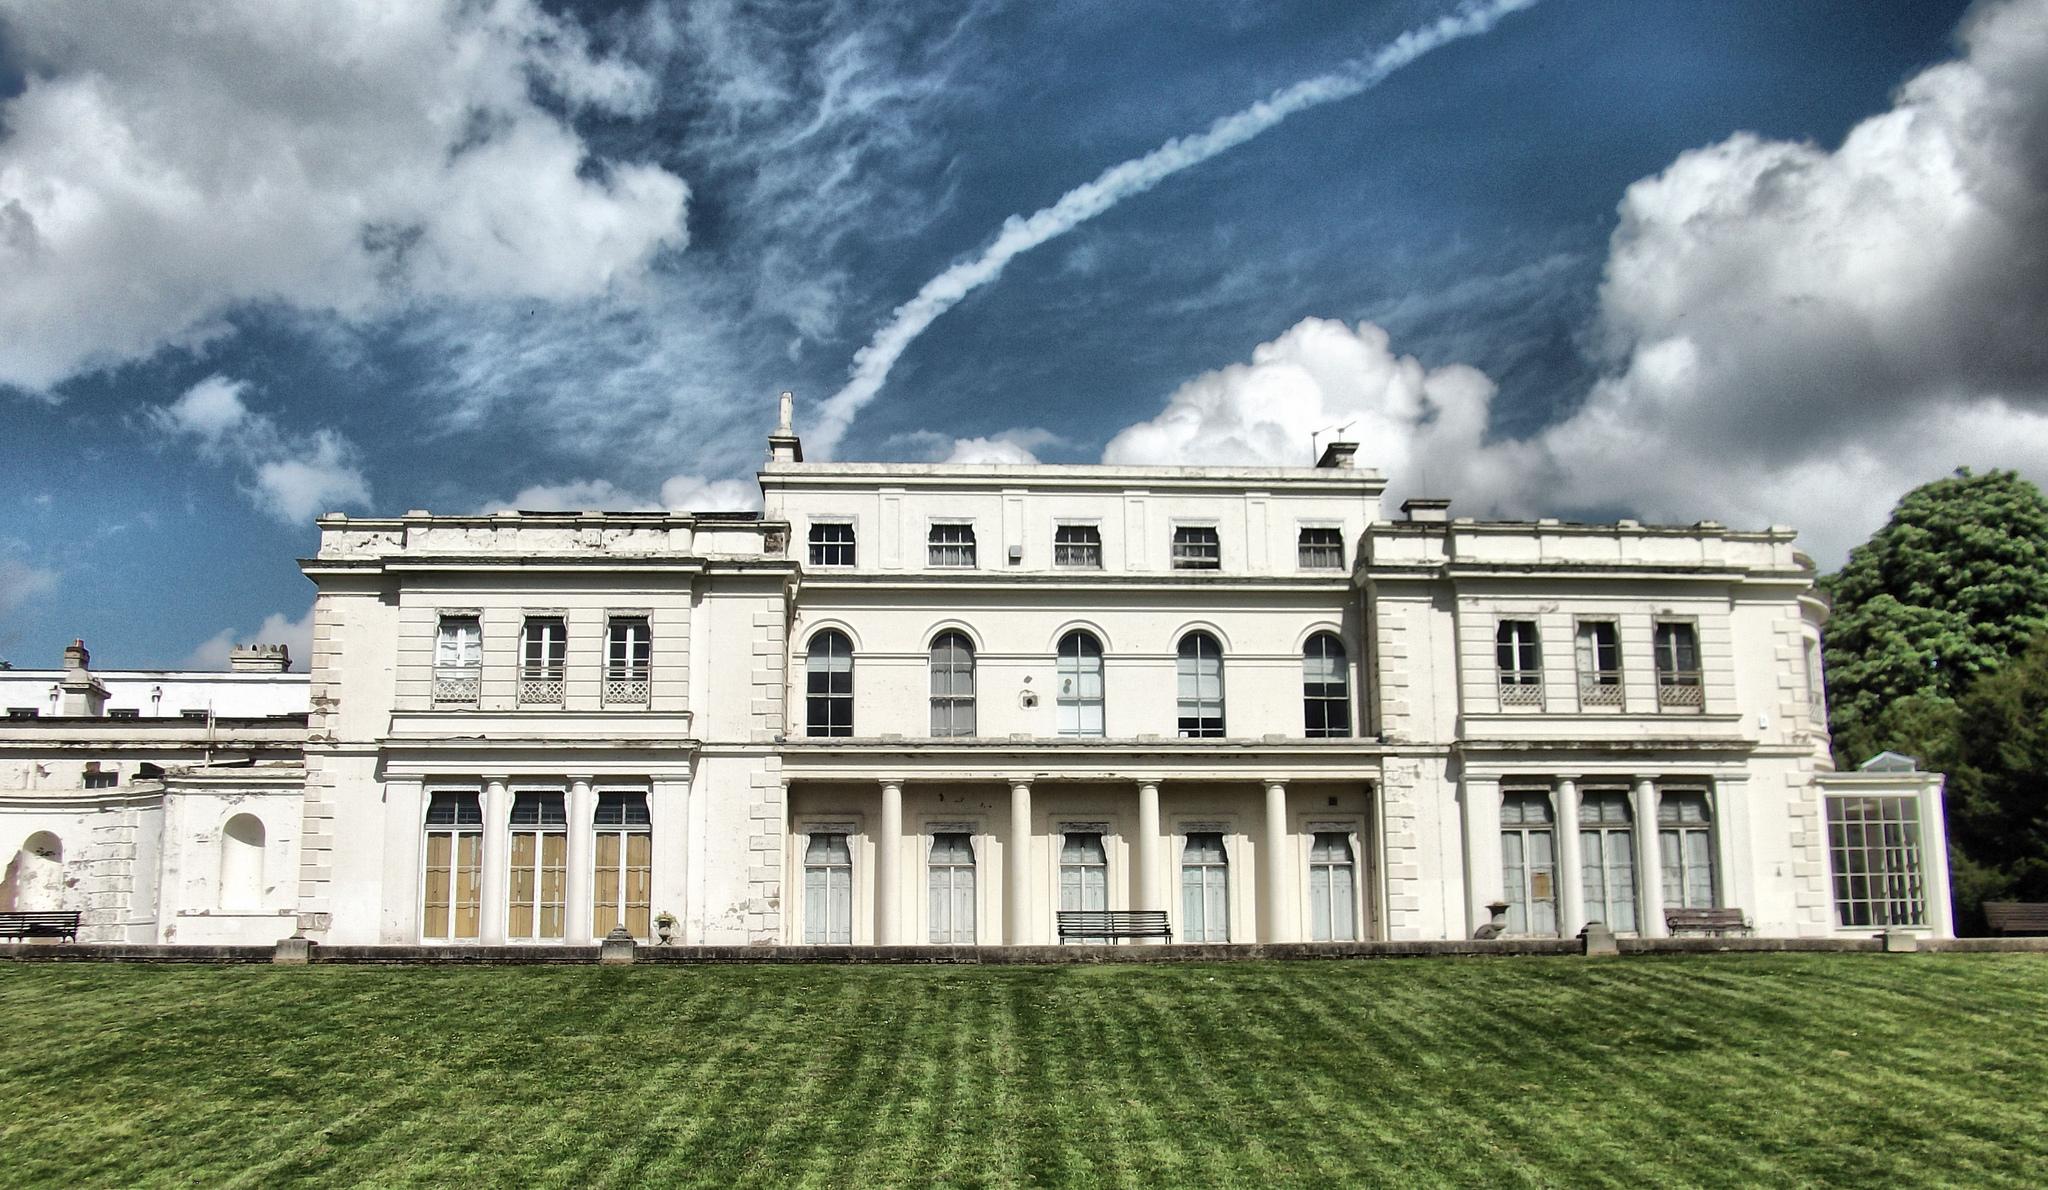 Gunnersbury-Park-Museum-London..jpg